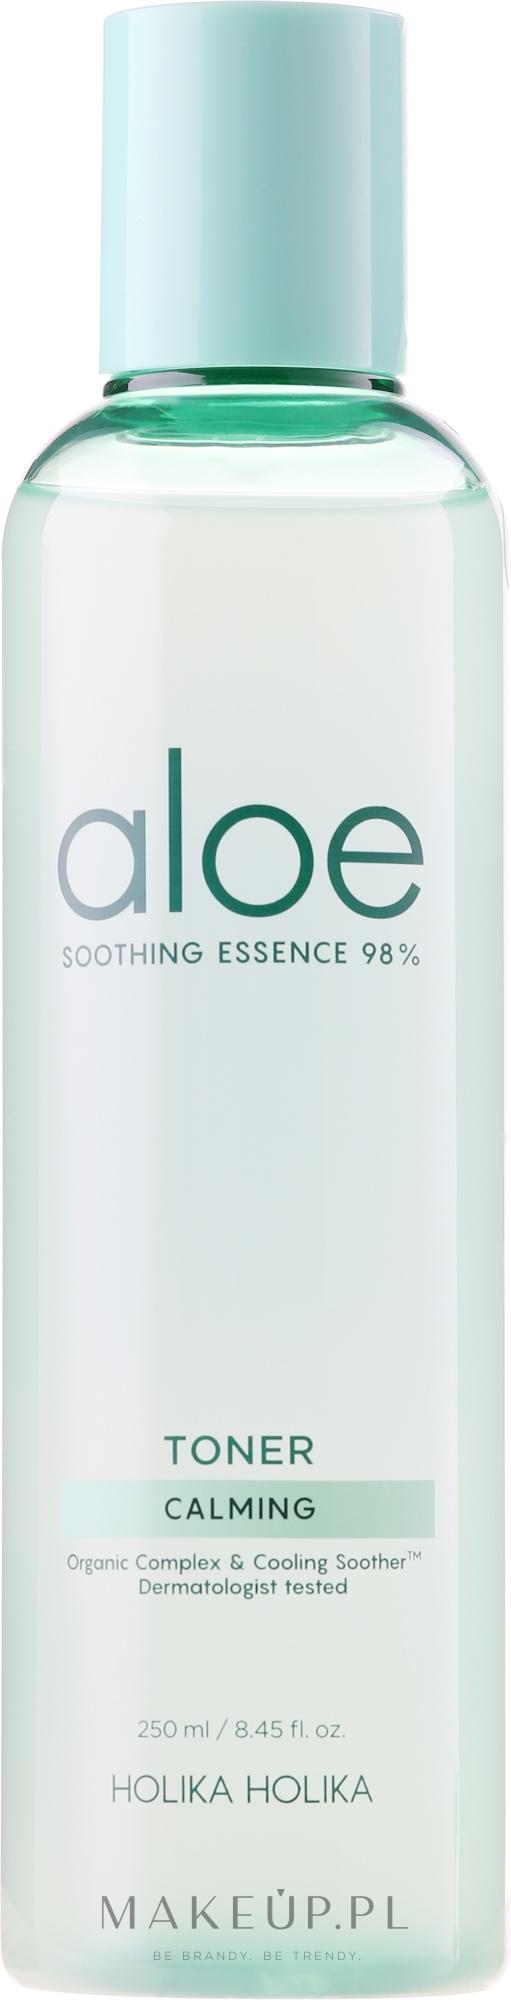 Kojący tonik do twarzy - Holika Holika Aloe Soothing Essence 98% Toner Calming — фото 250 ml